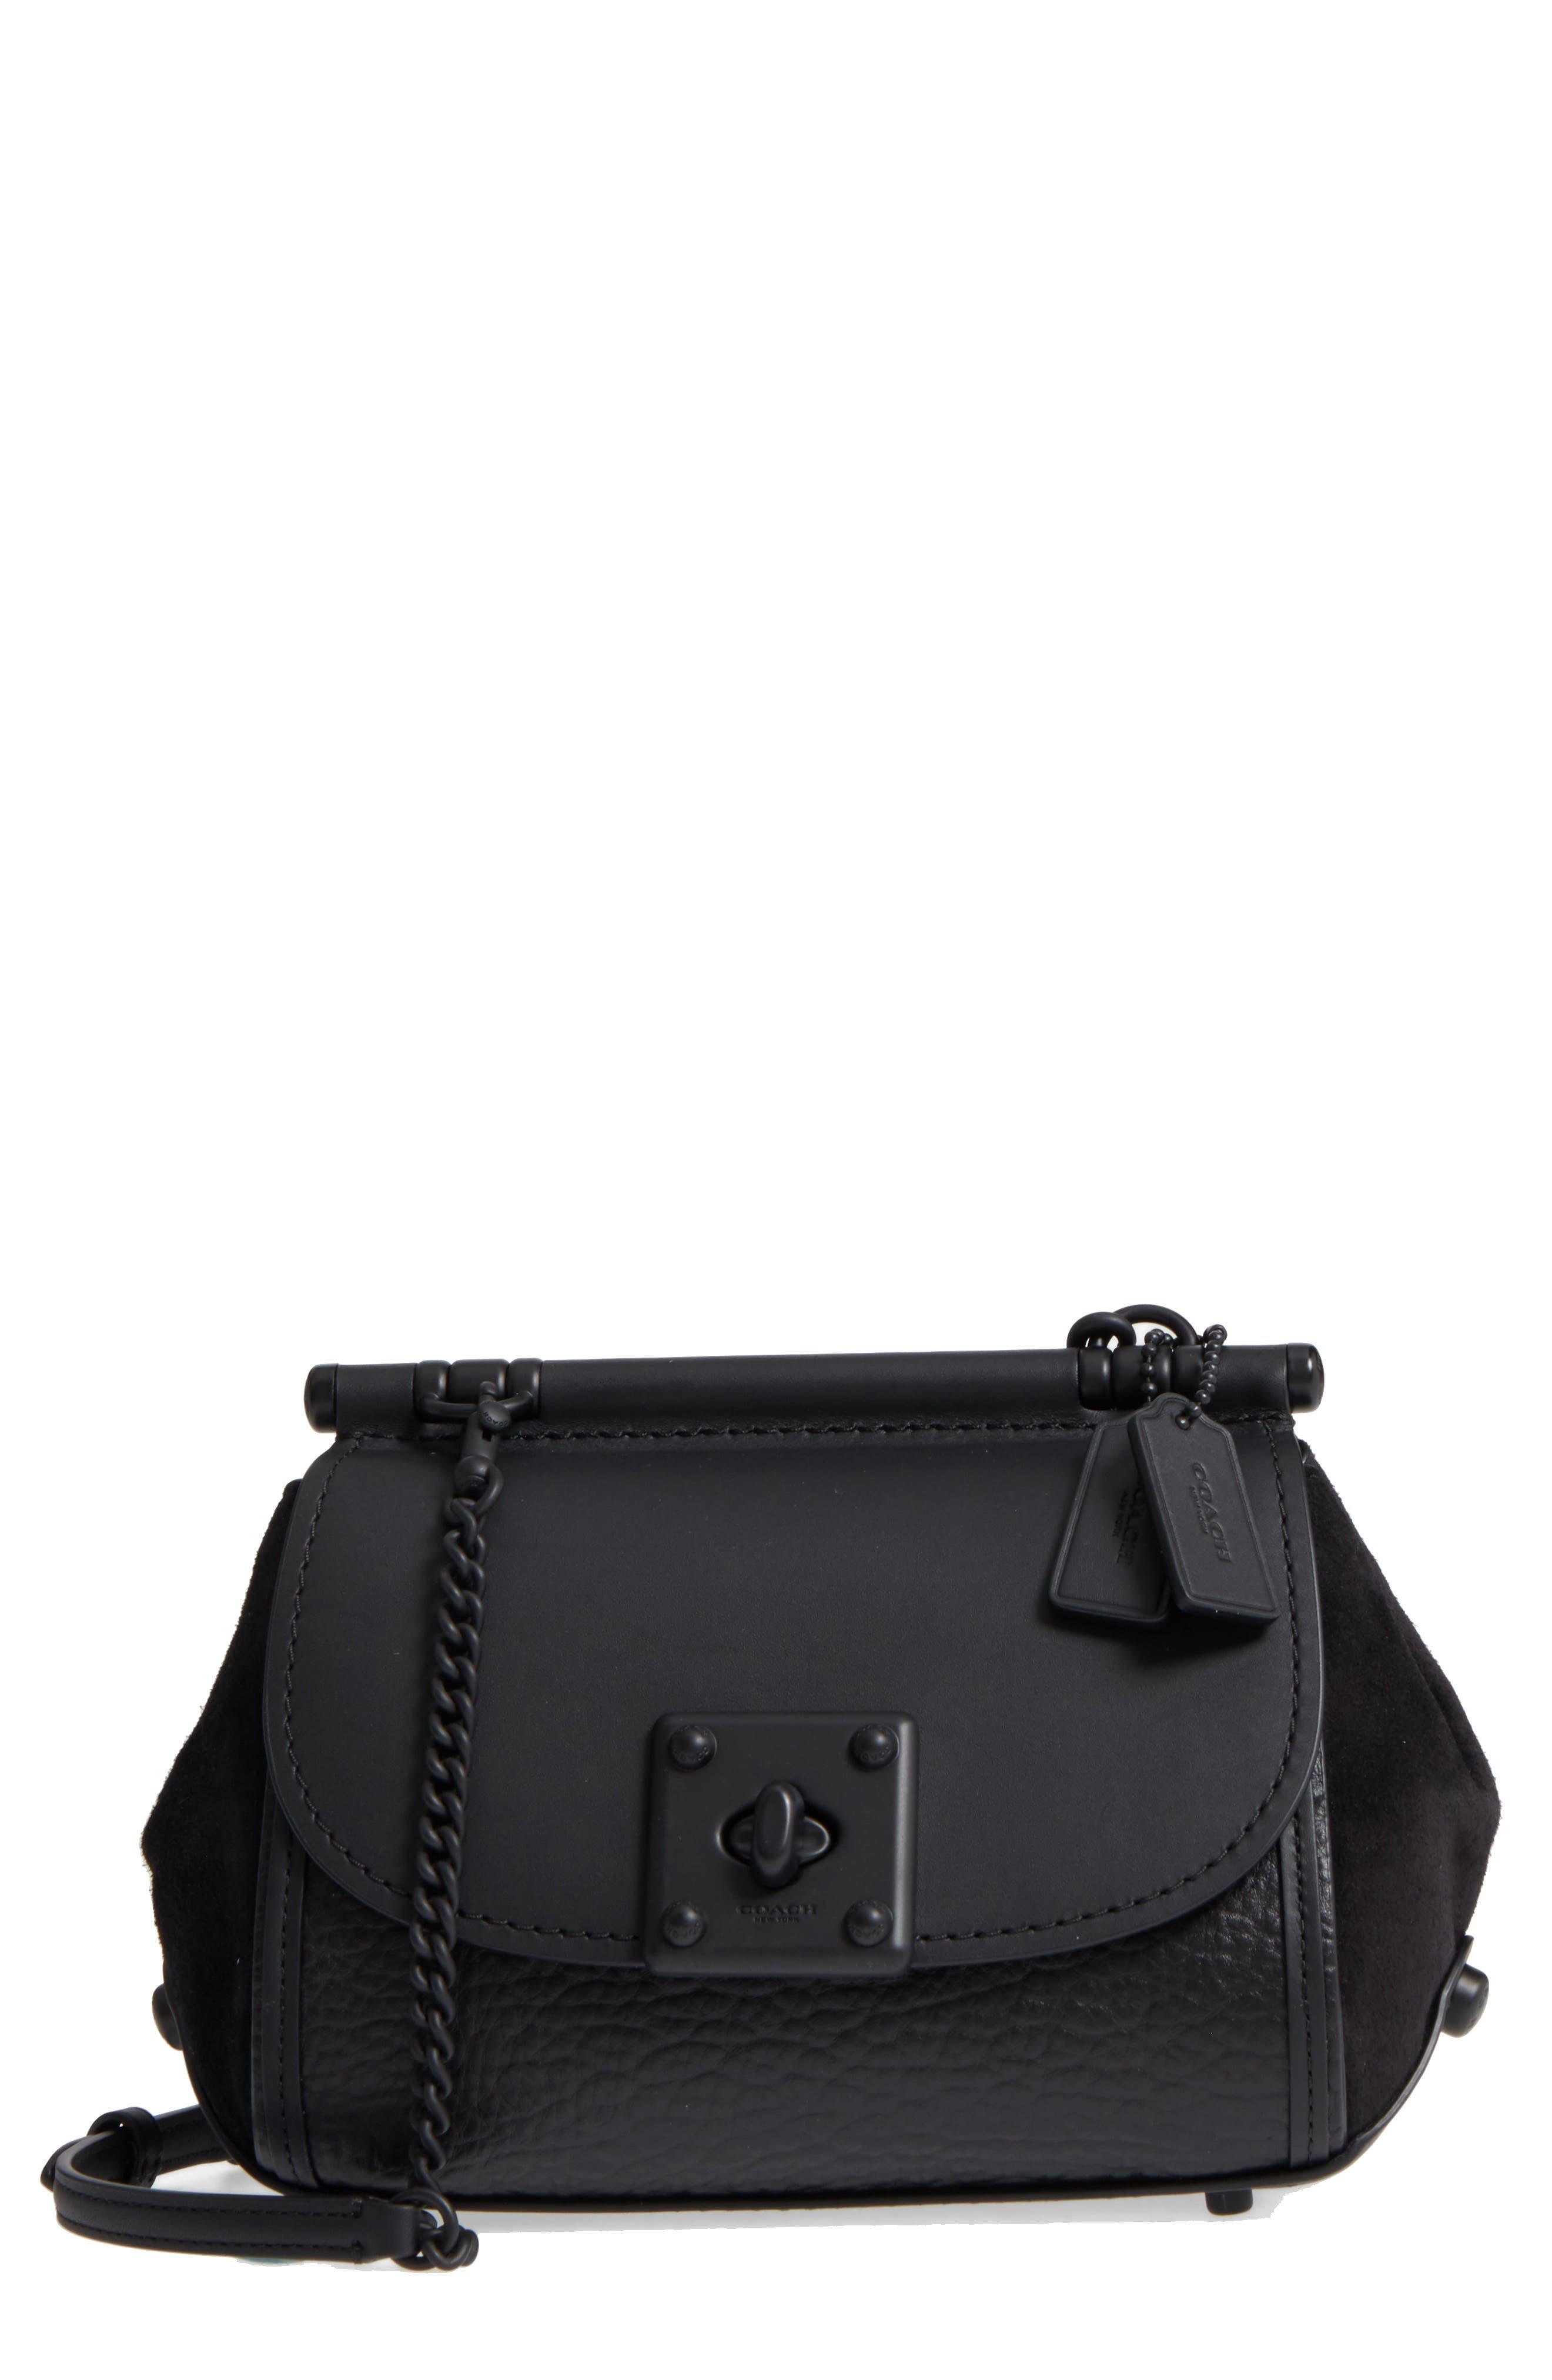 Main Image - COACH Mixed Leather Crossbody Bag